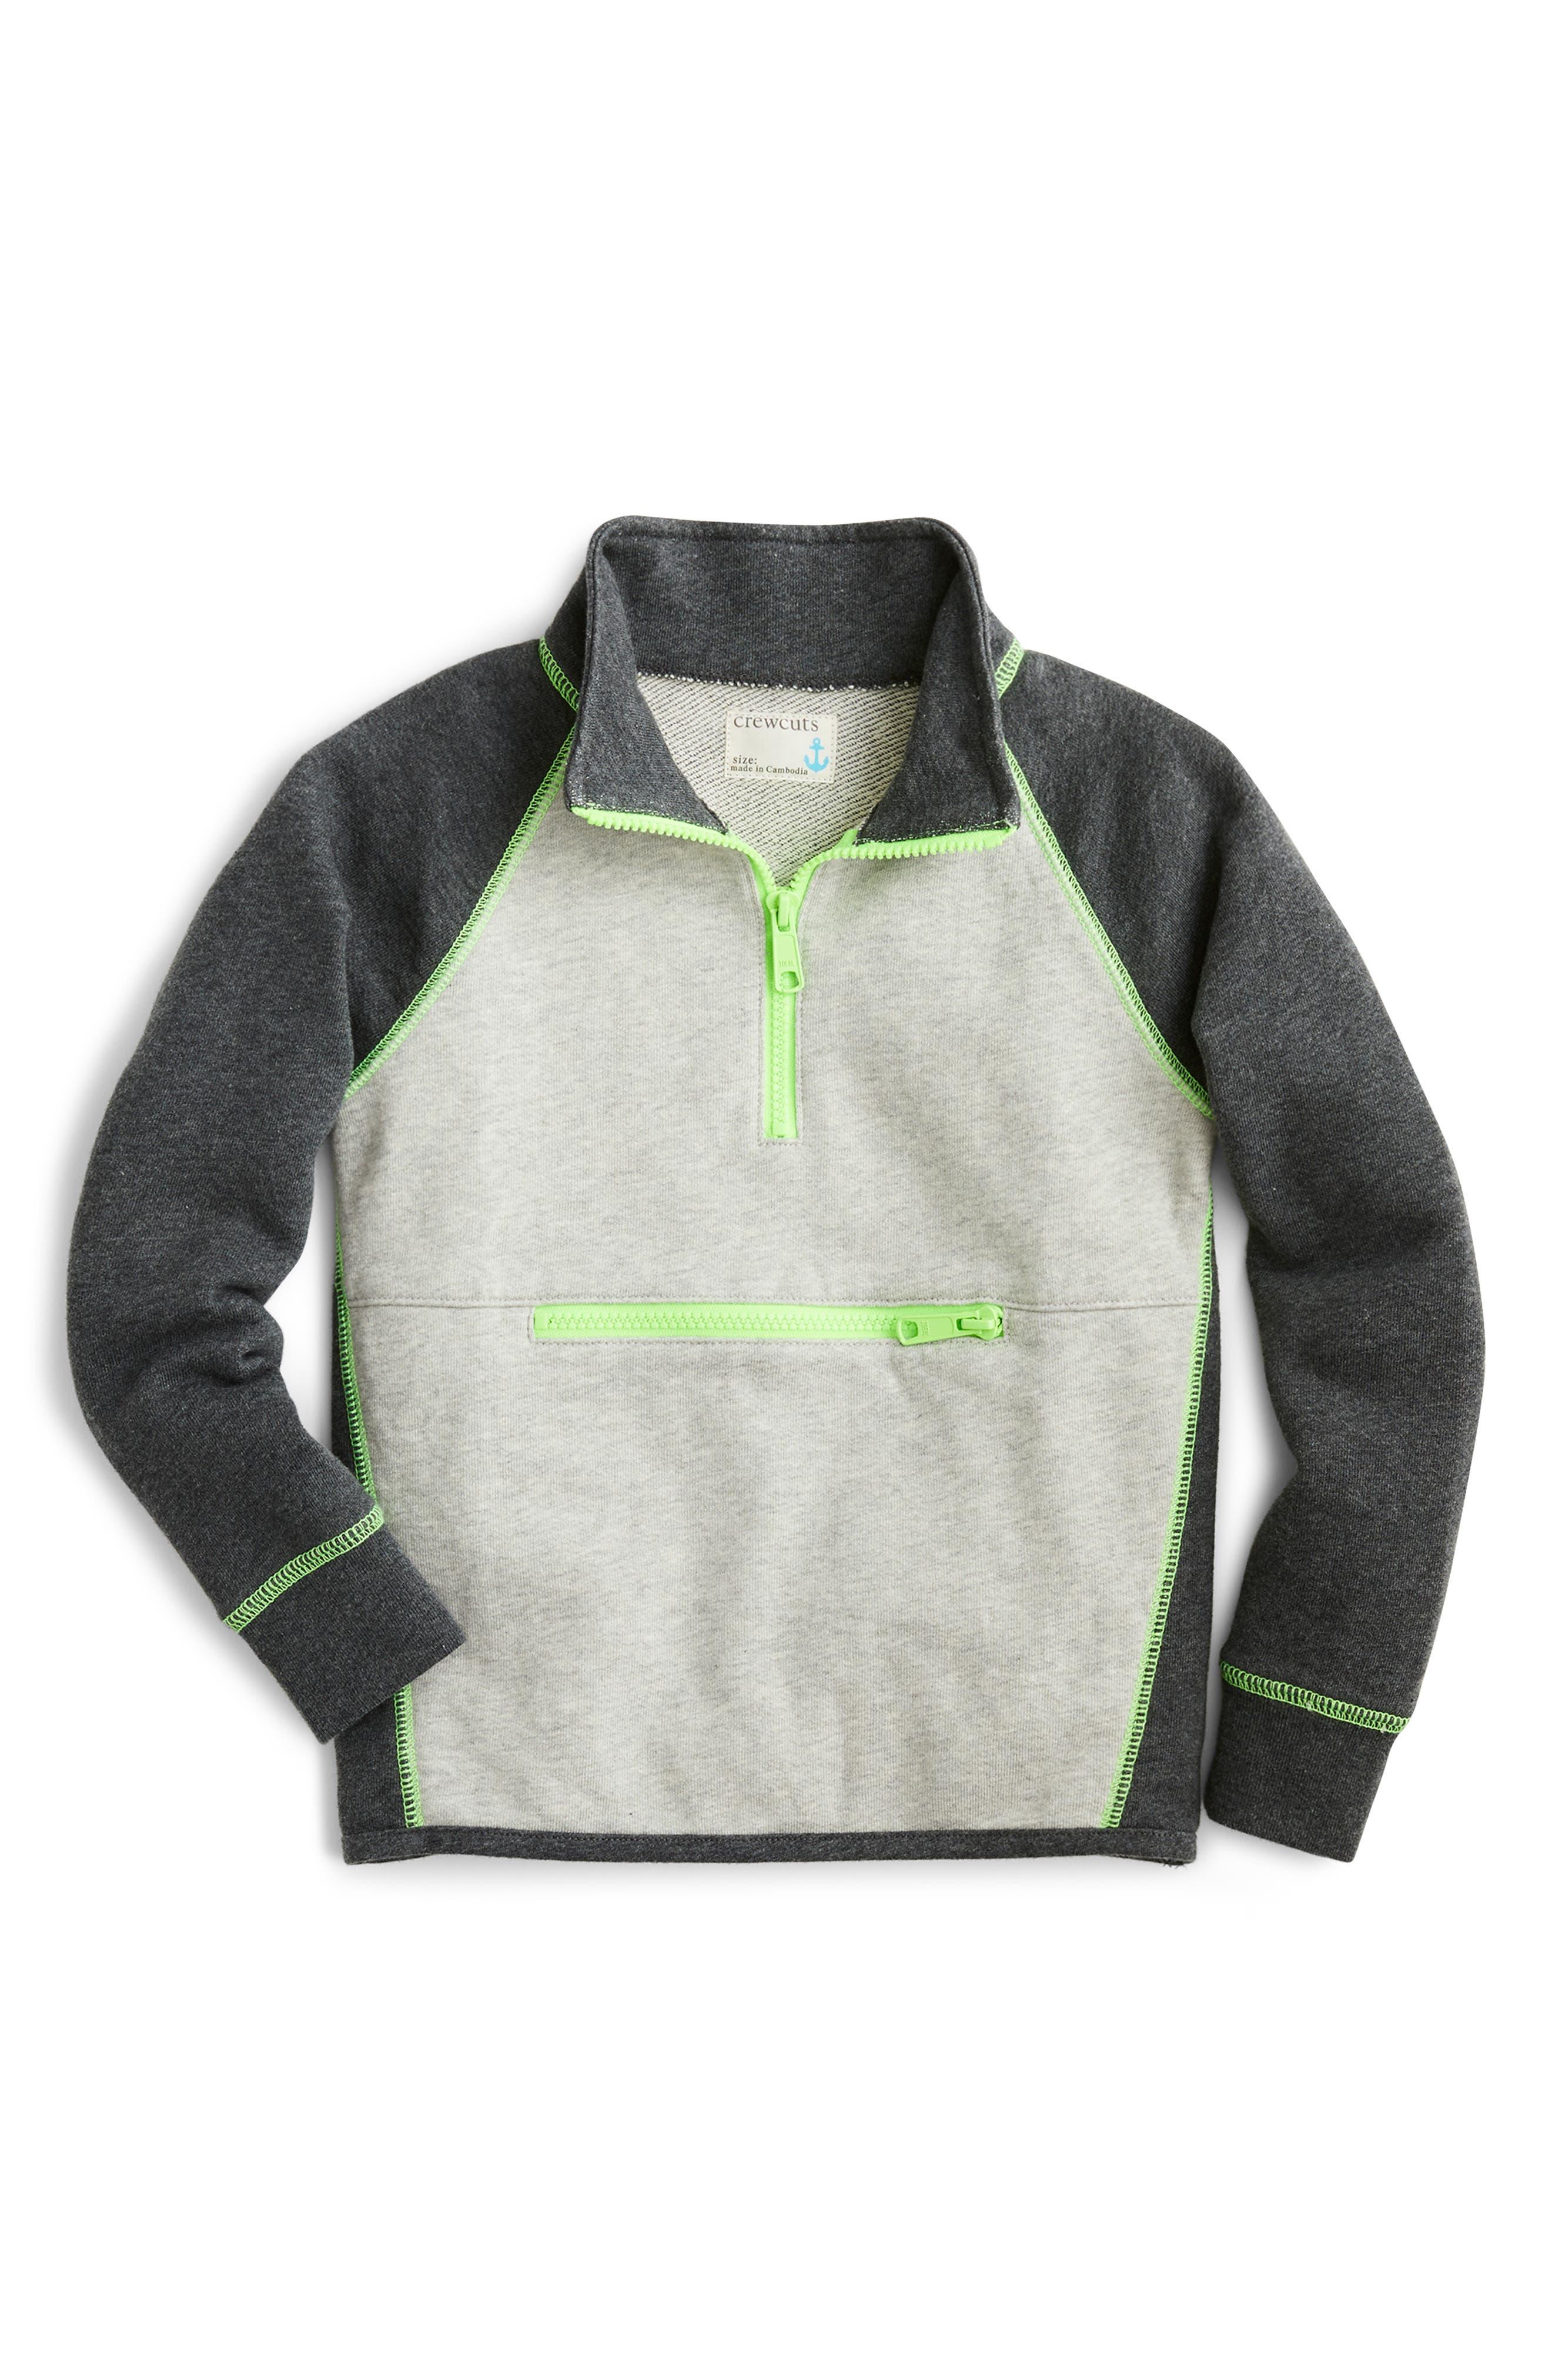 Boys Crewcuts By Jcrew Colorblock Half Zip Sweatshirt Size 16  Grey